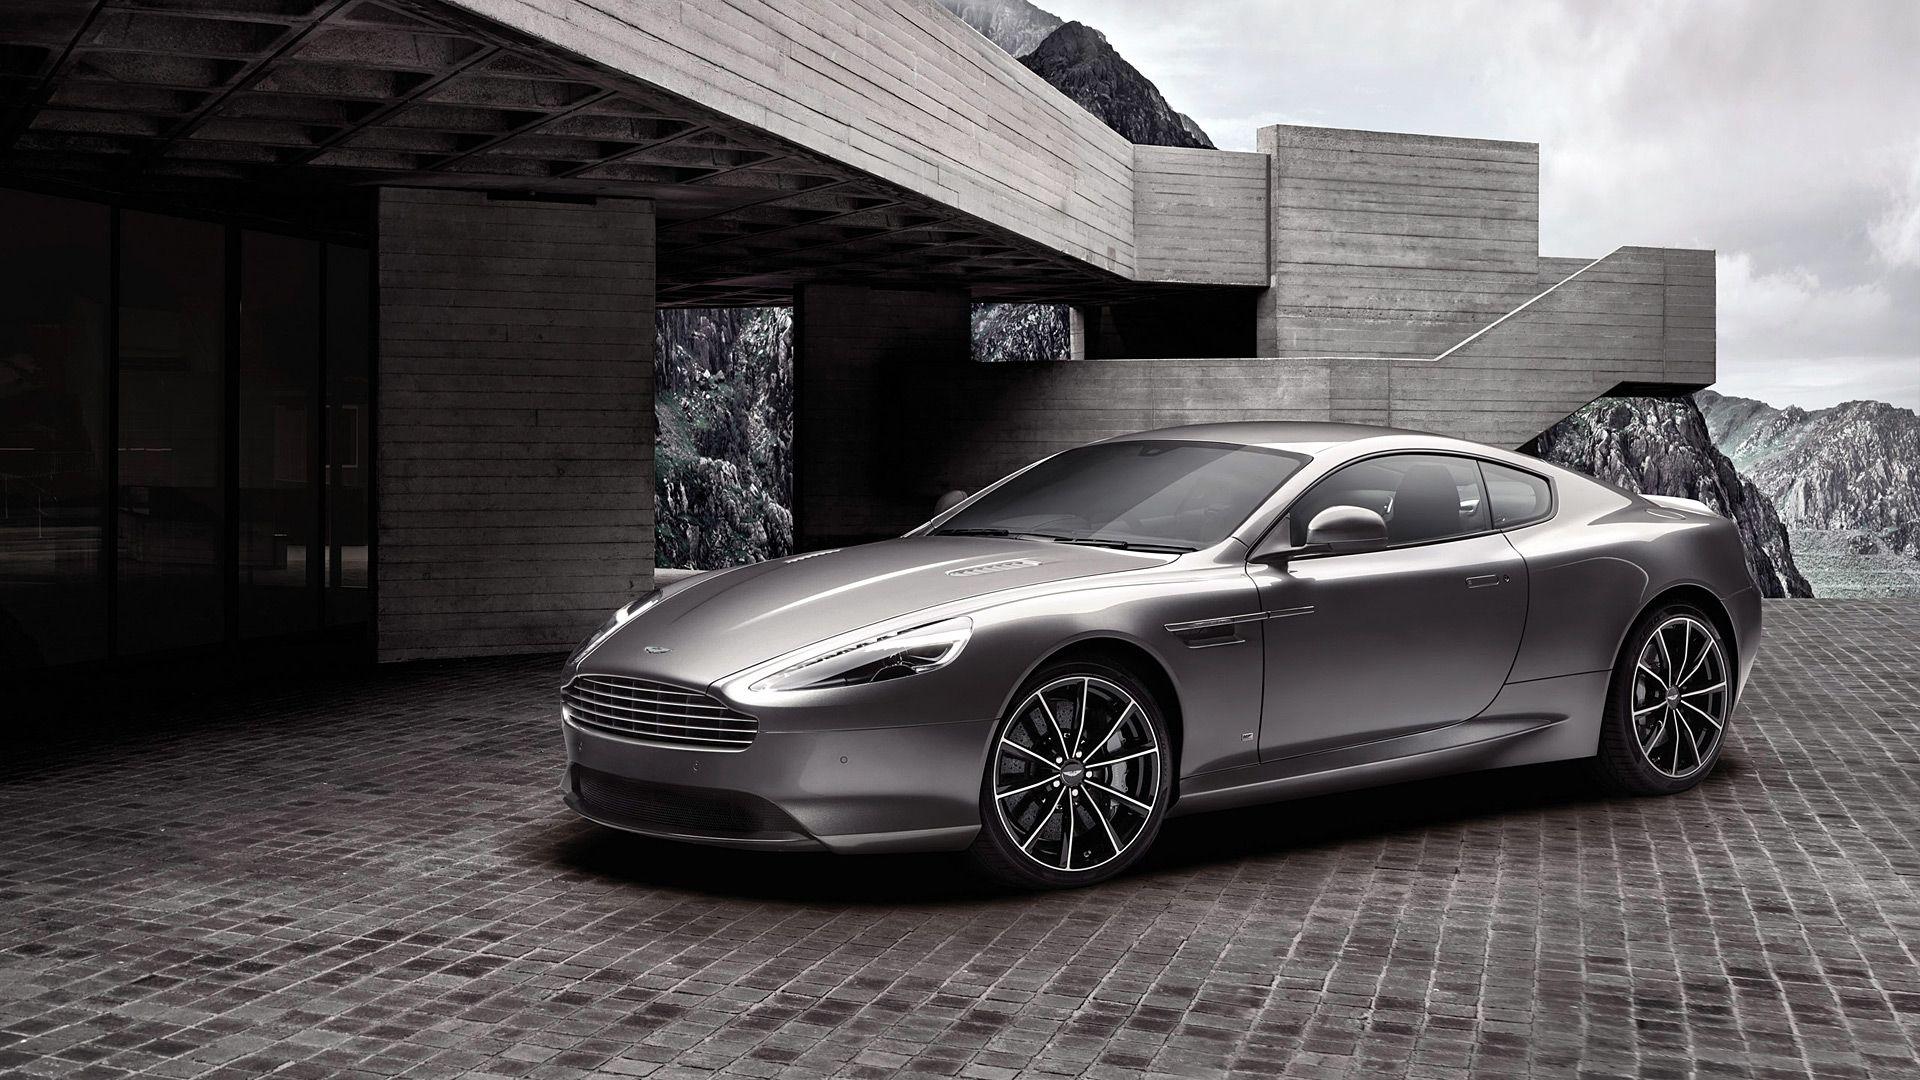 2015 Aston Martin DB9 GT Bond Edition  http://www.wsupercars.com/aston-martin-2015-db9-gt-bond-edition.php